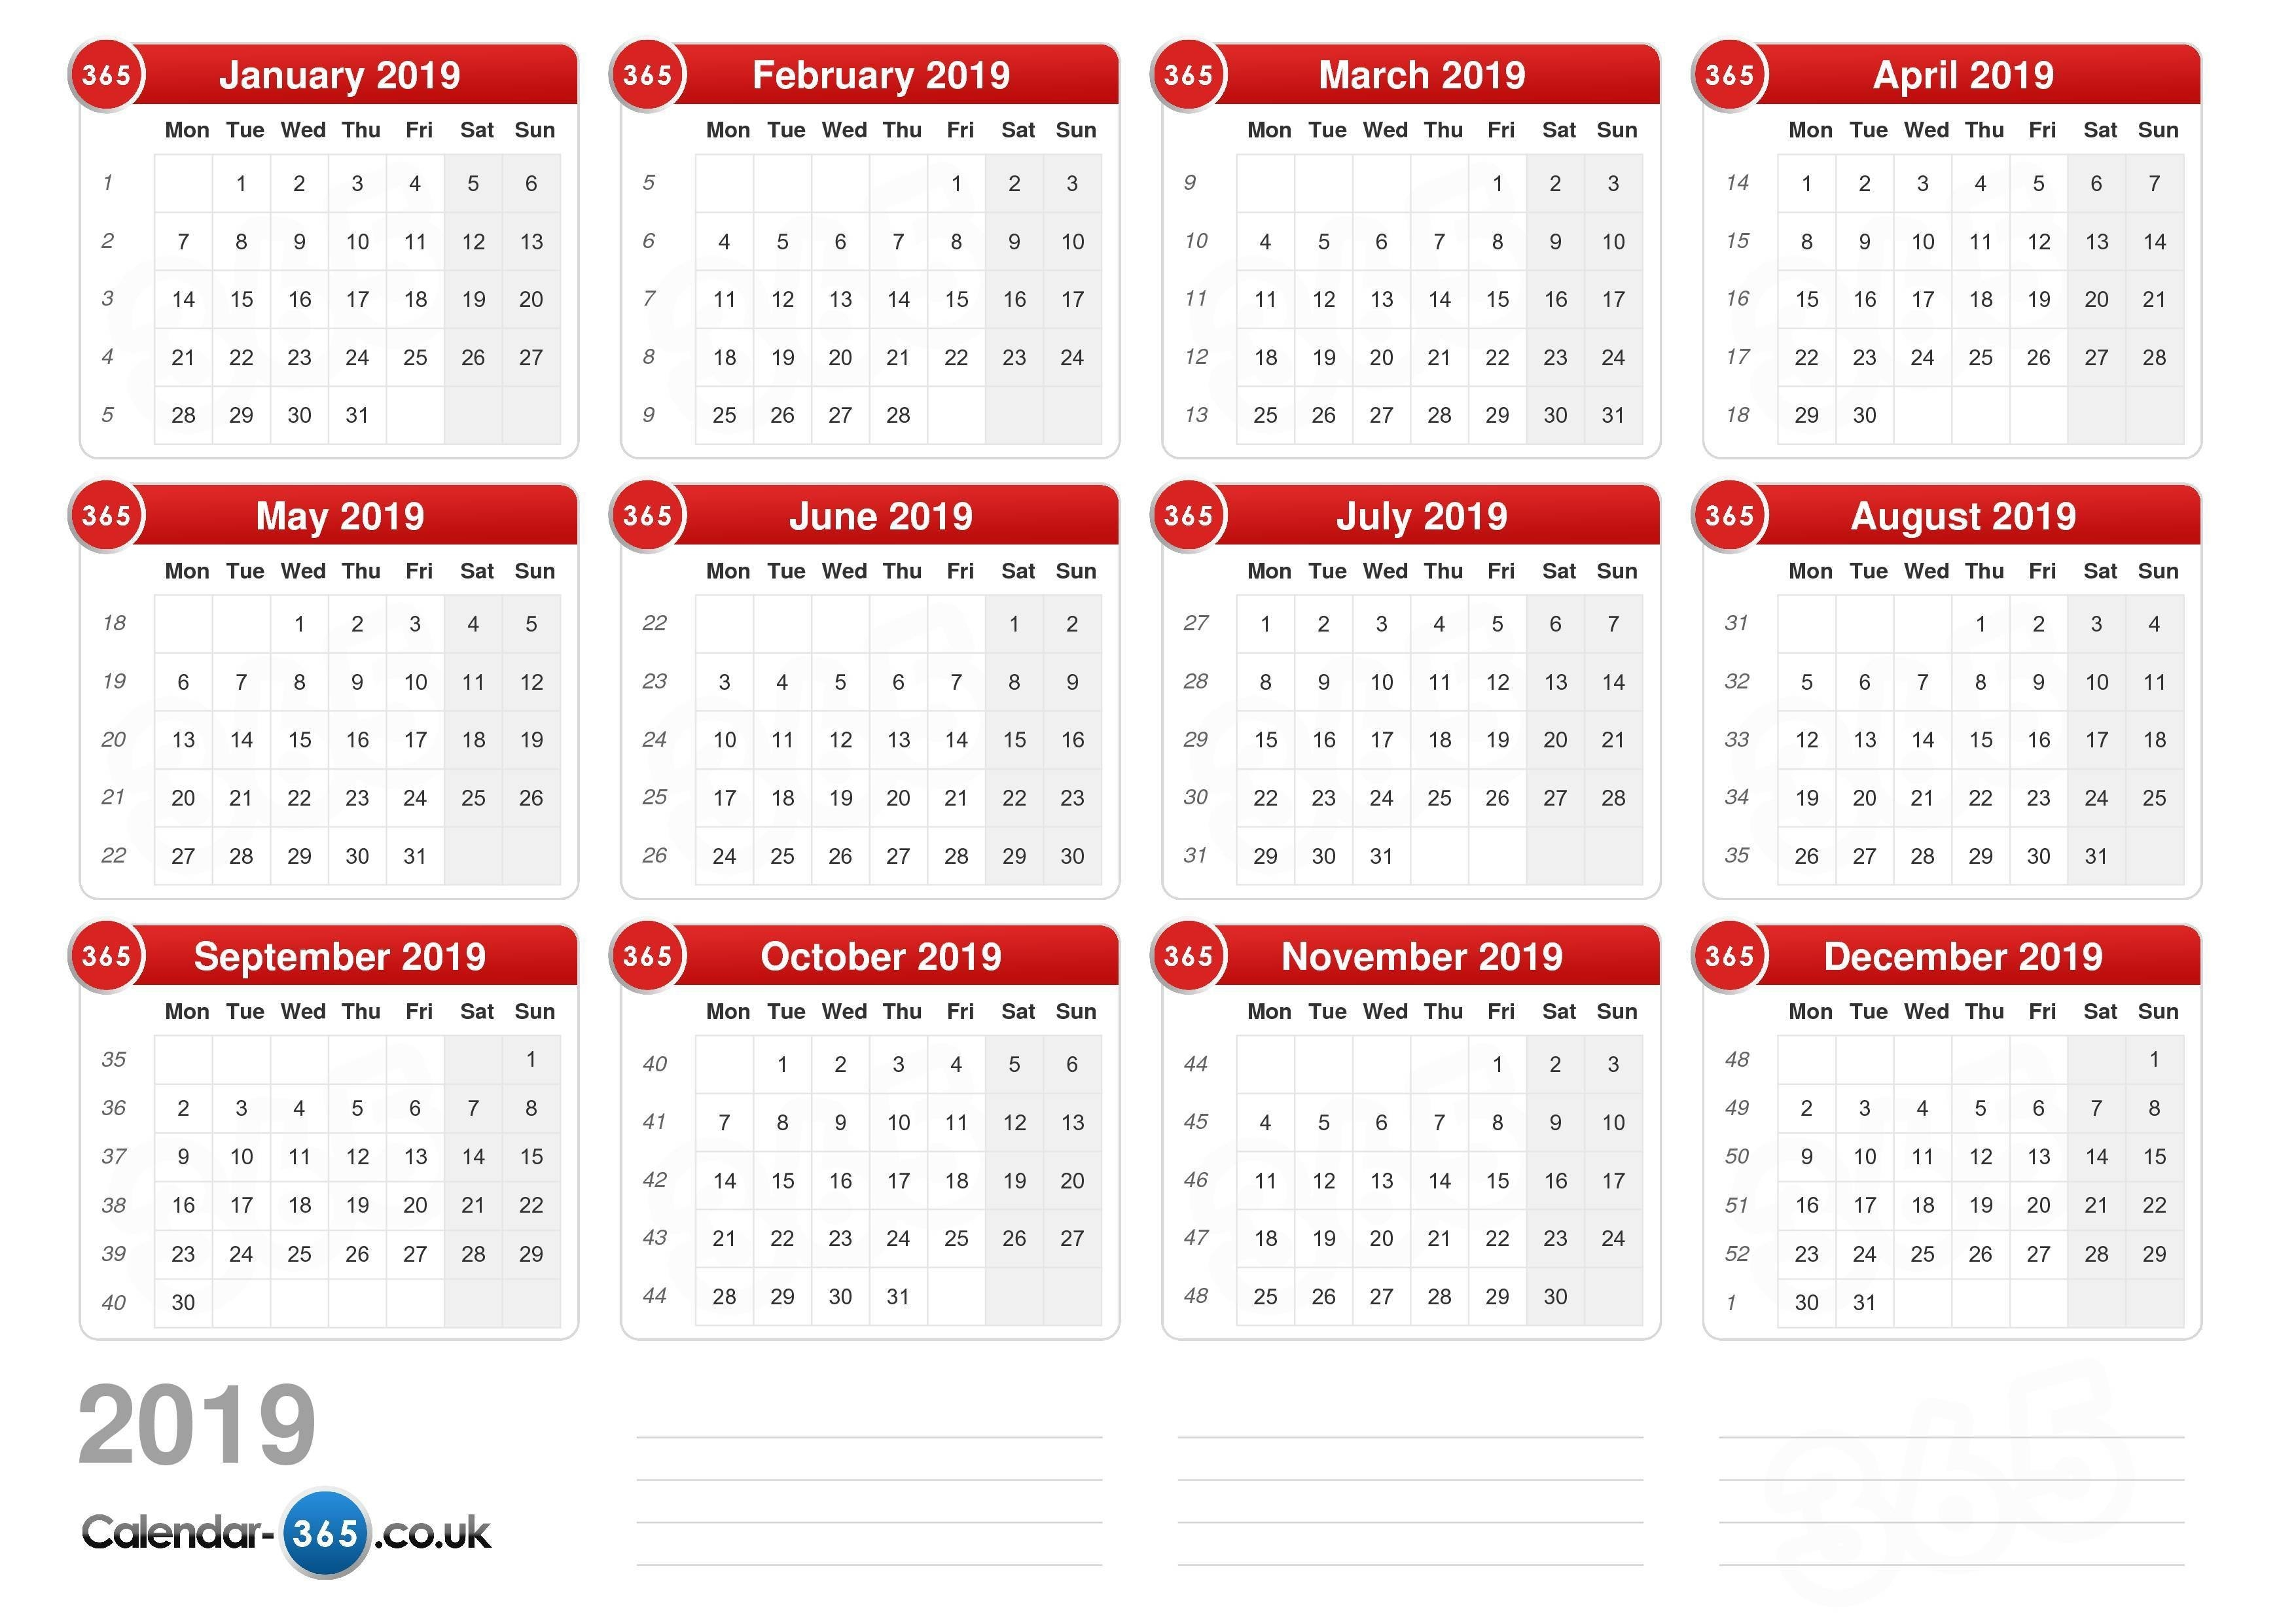 Calendar 2019 Calendar 4 2019